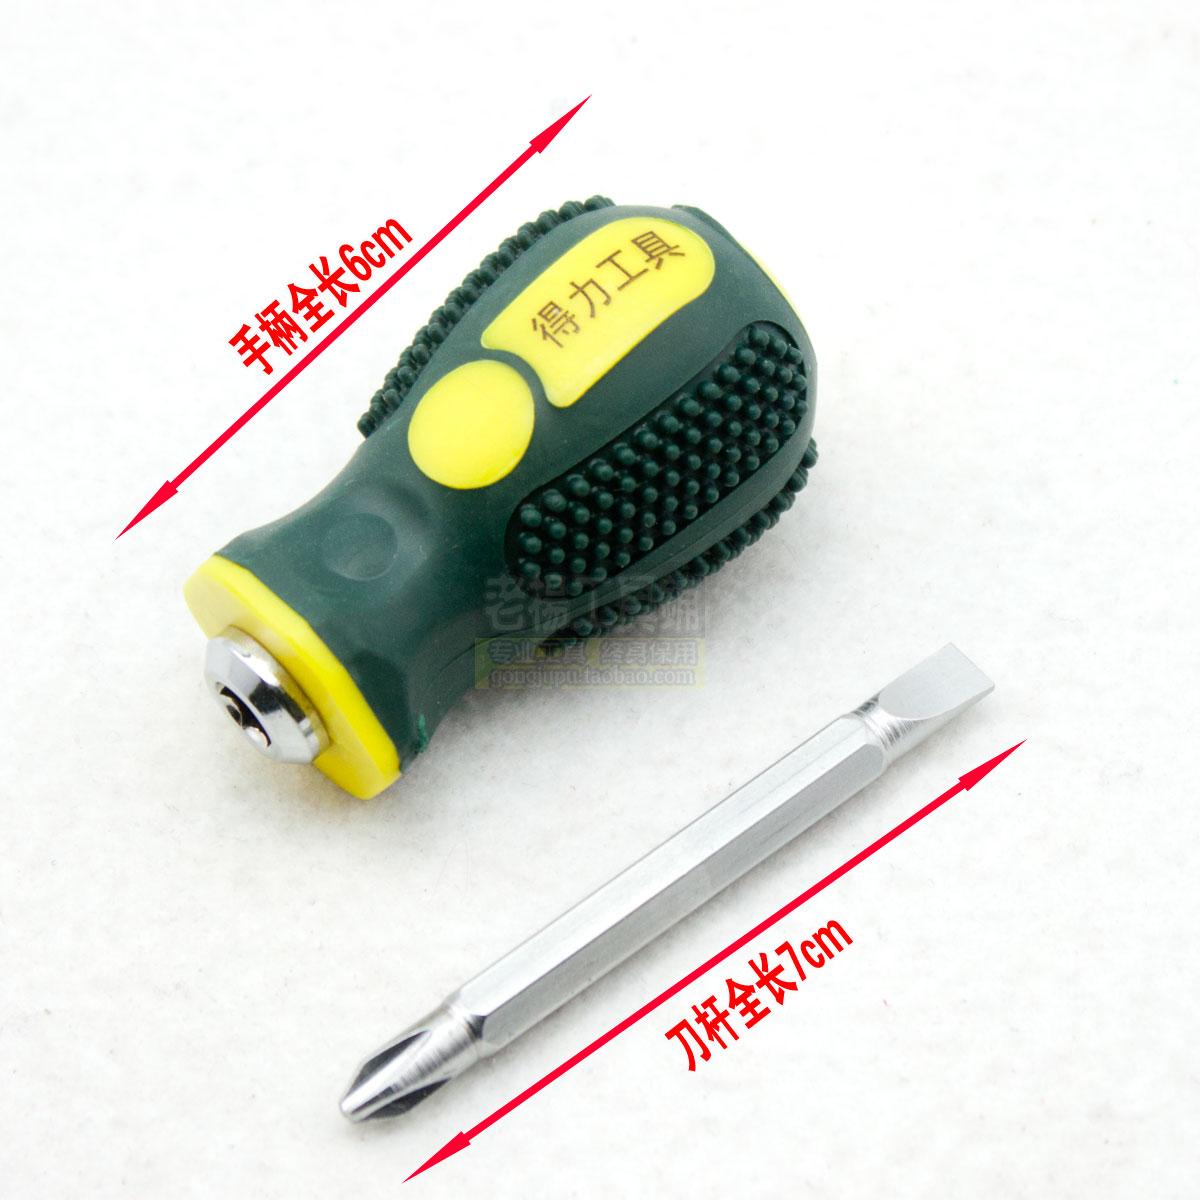 Набор отвёрток 秒杀 得力工具 两用螺丝刀 6*38螺丝刀 短型螺丝刀 100%正品